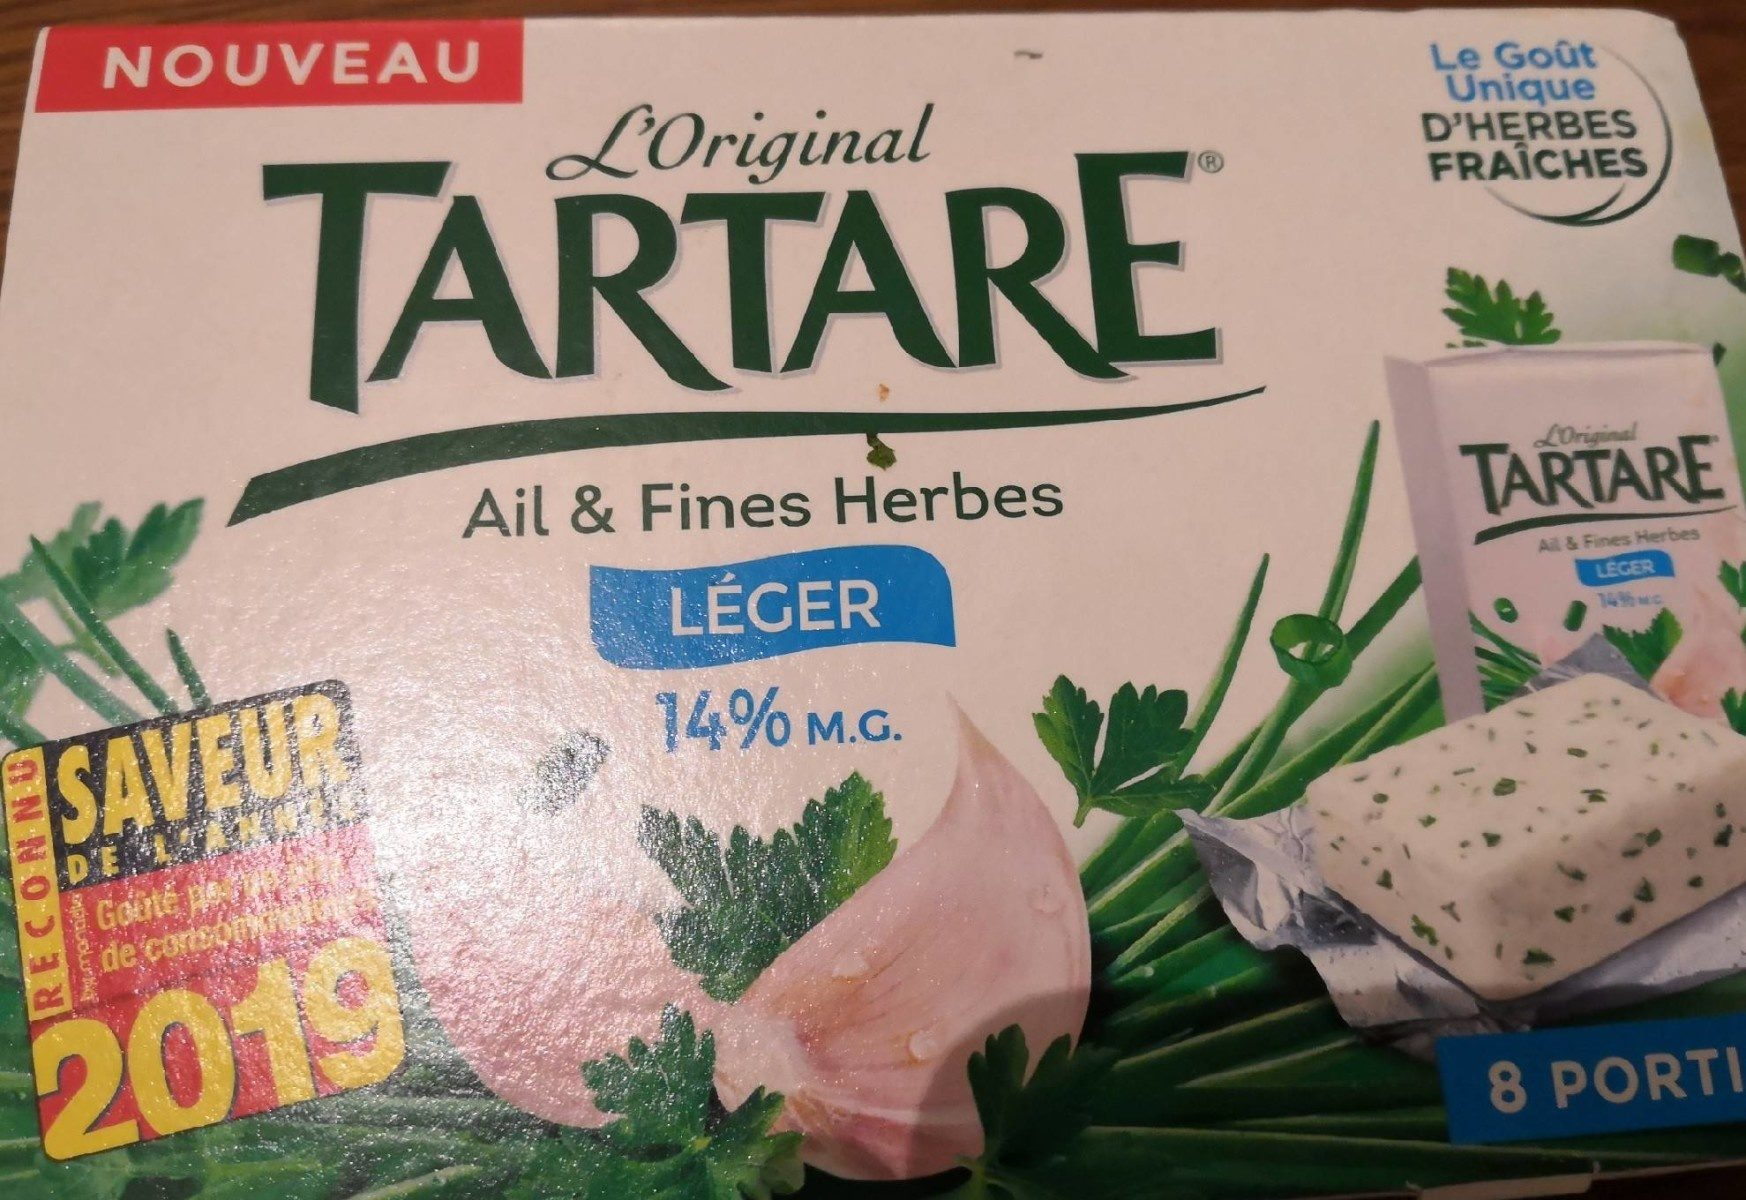 Tartare Ail et fines herbes Léger 14% - Produit - fr